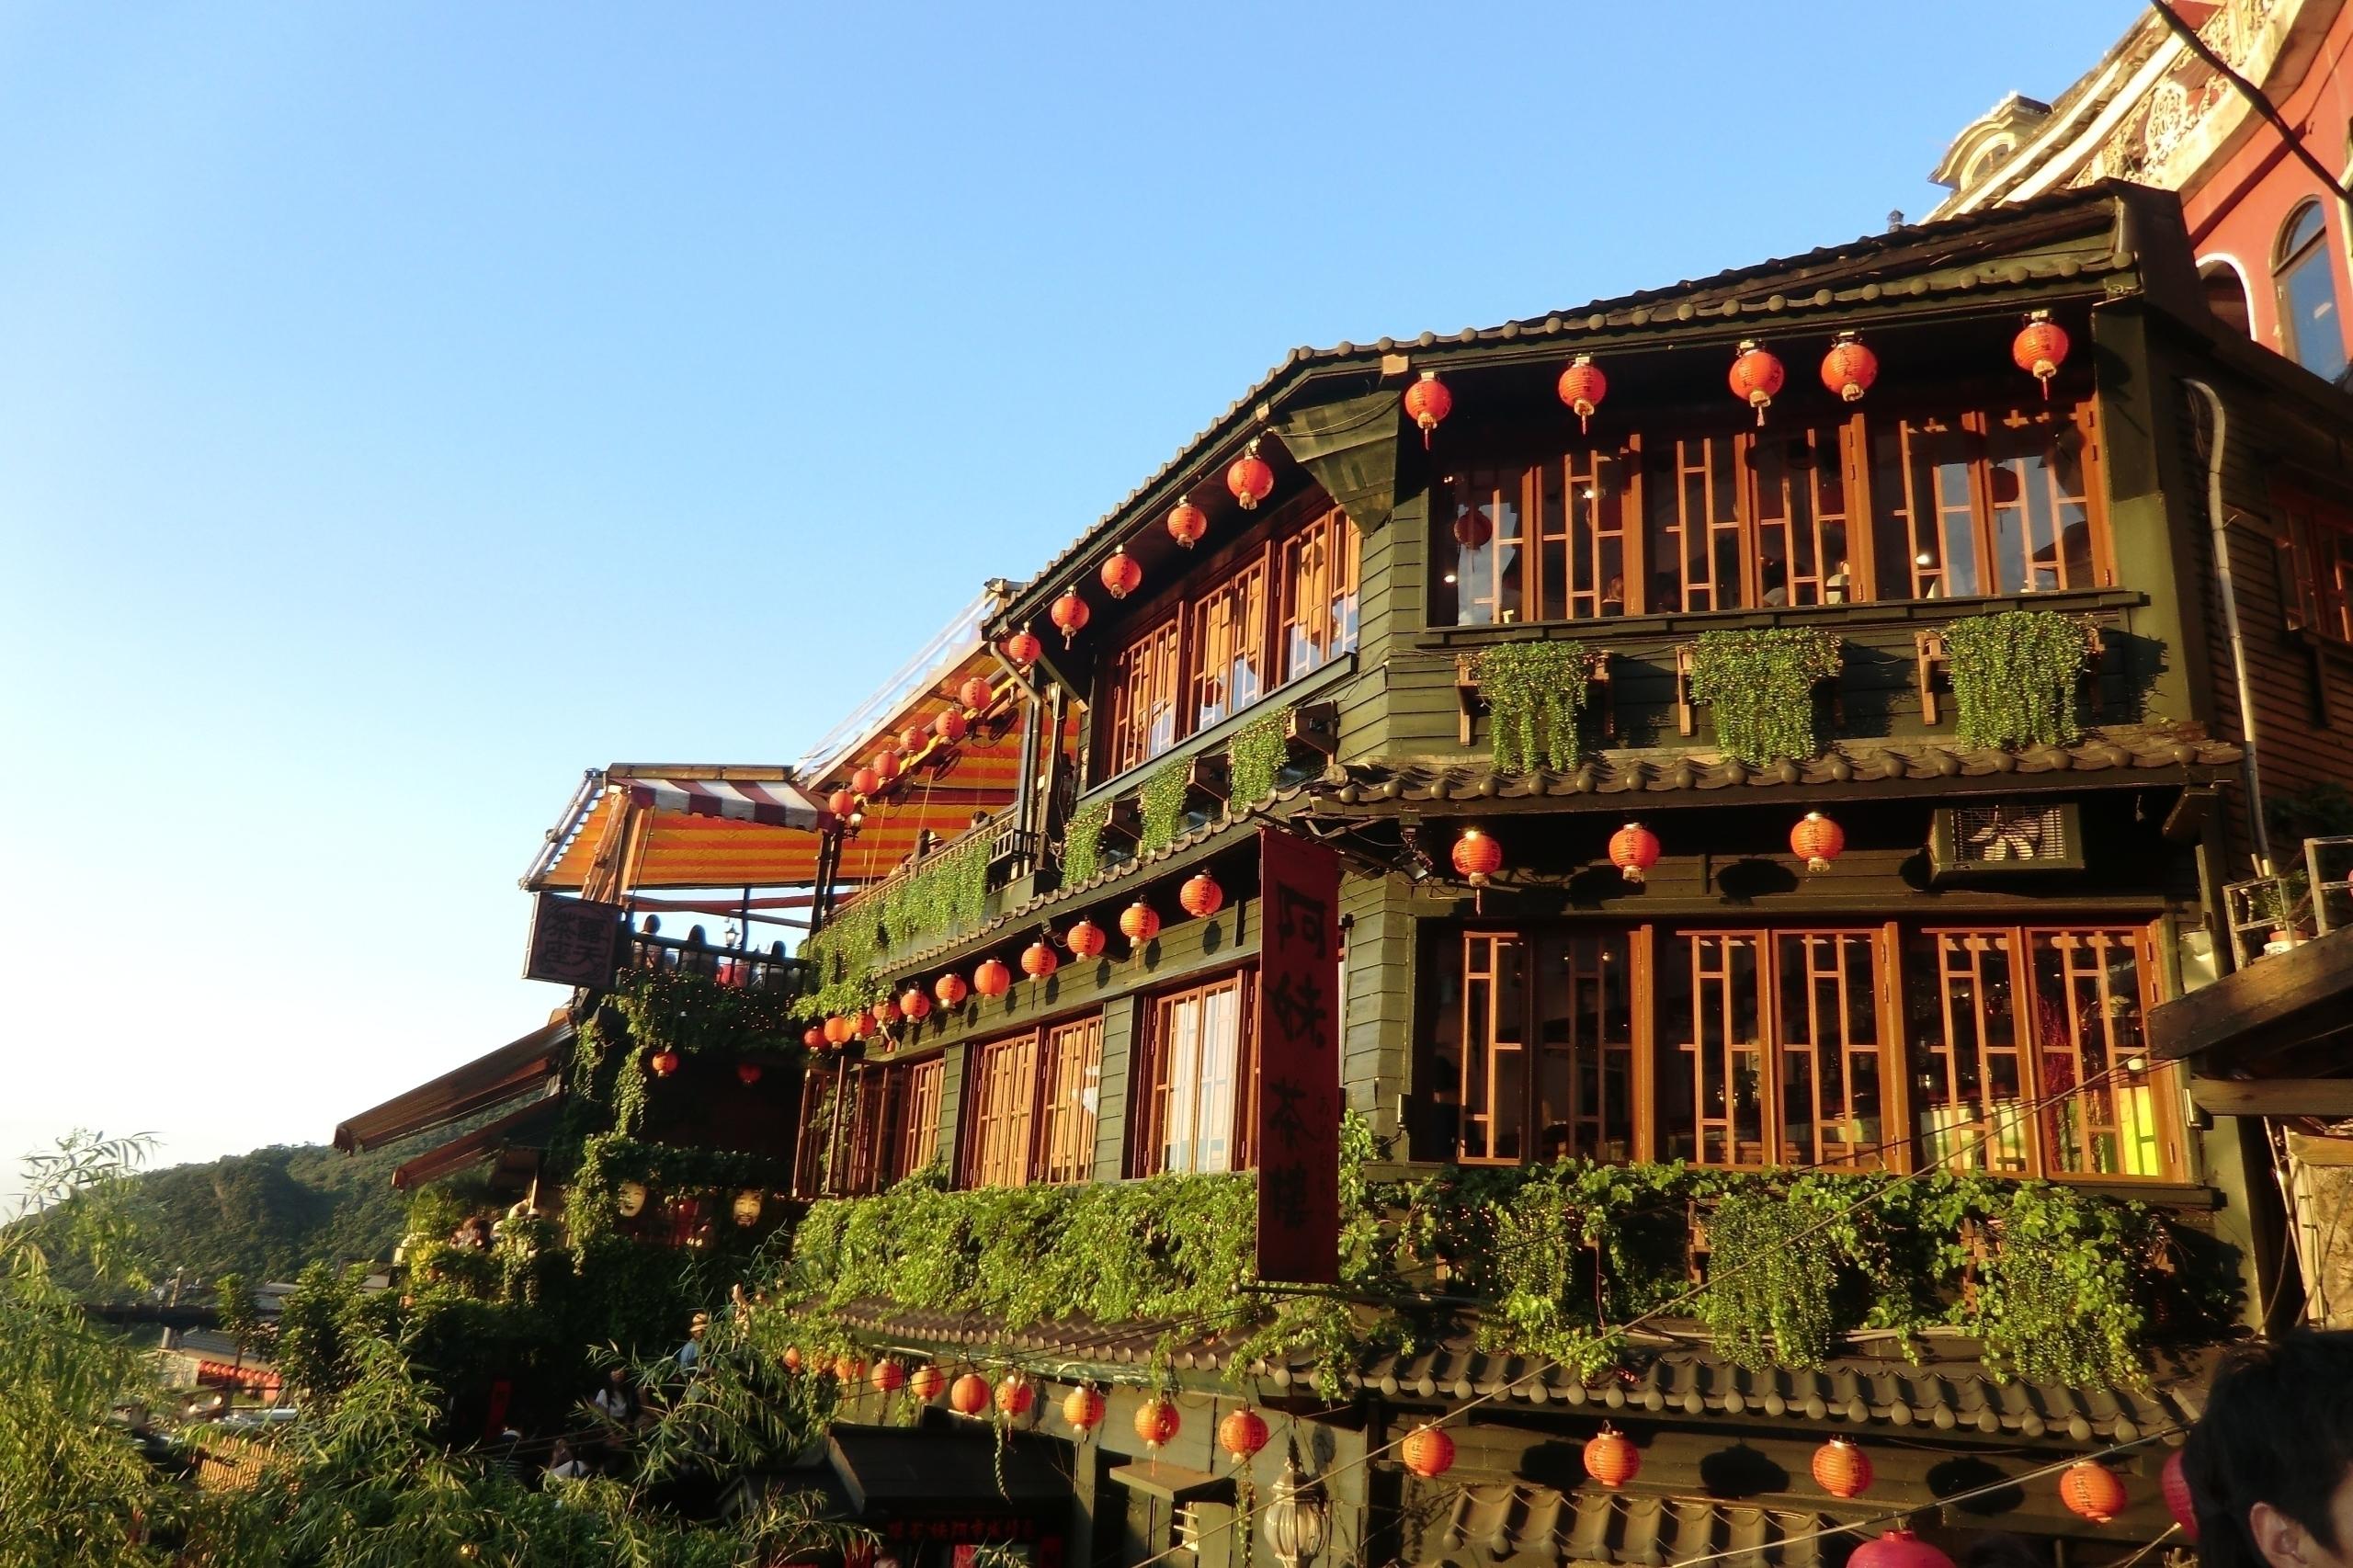 taiwan, Jiufen, photography, travel - sanftekuss | ello